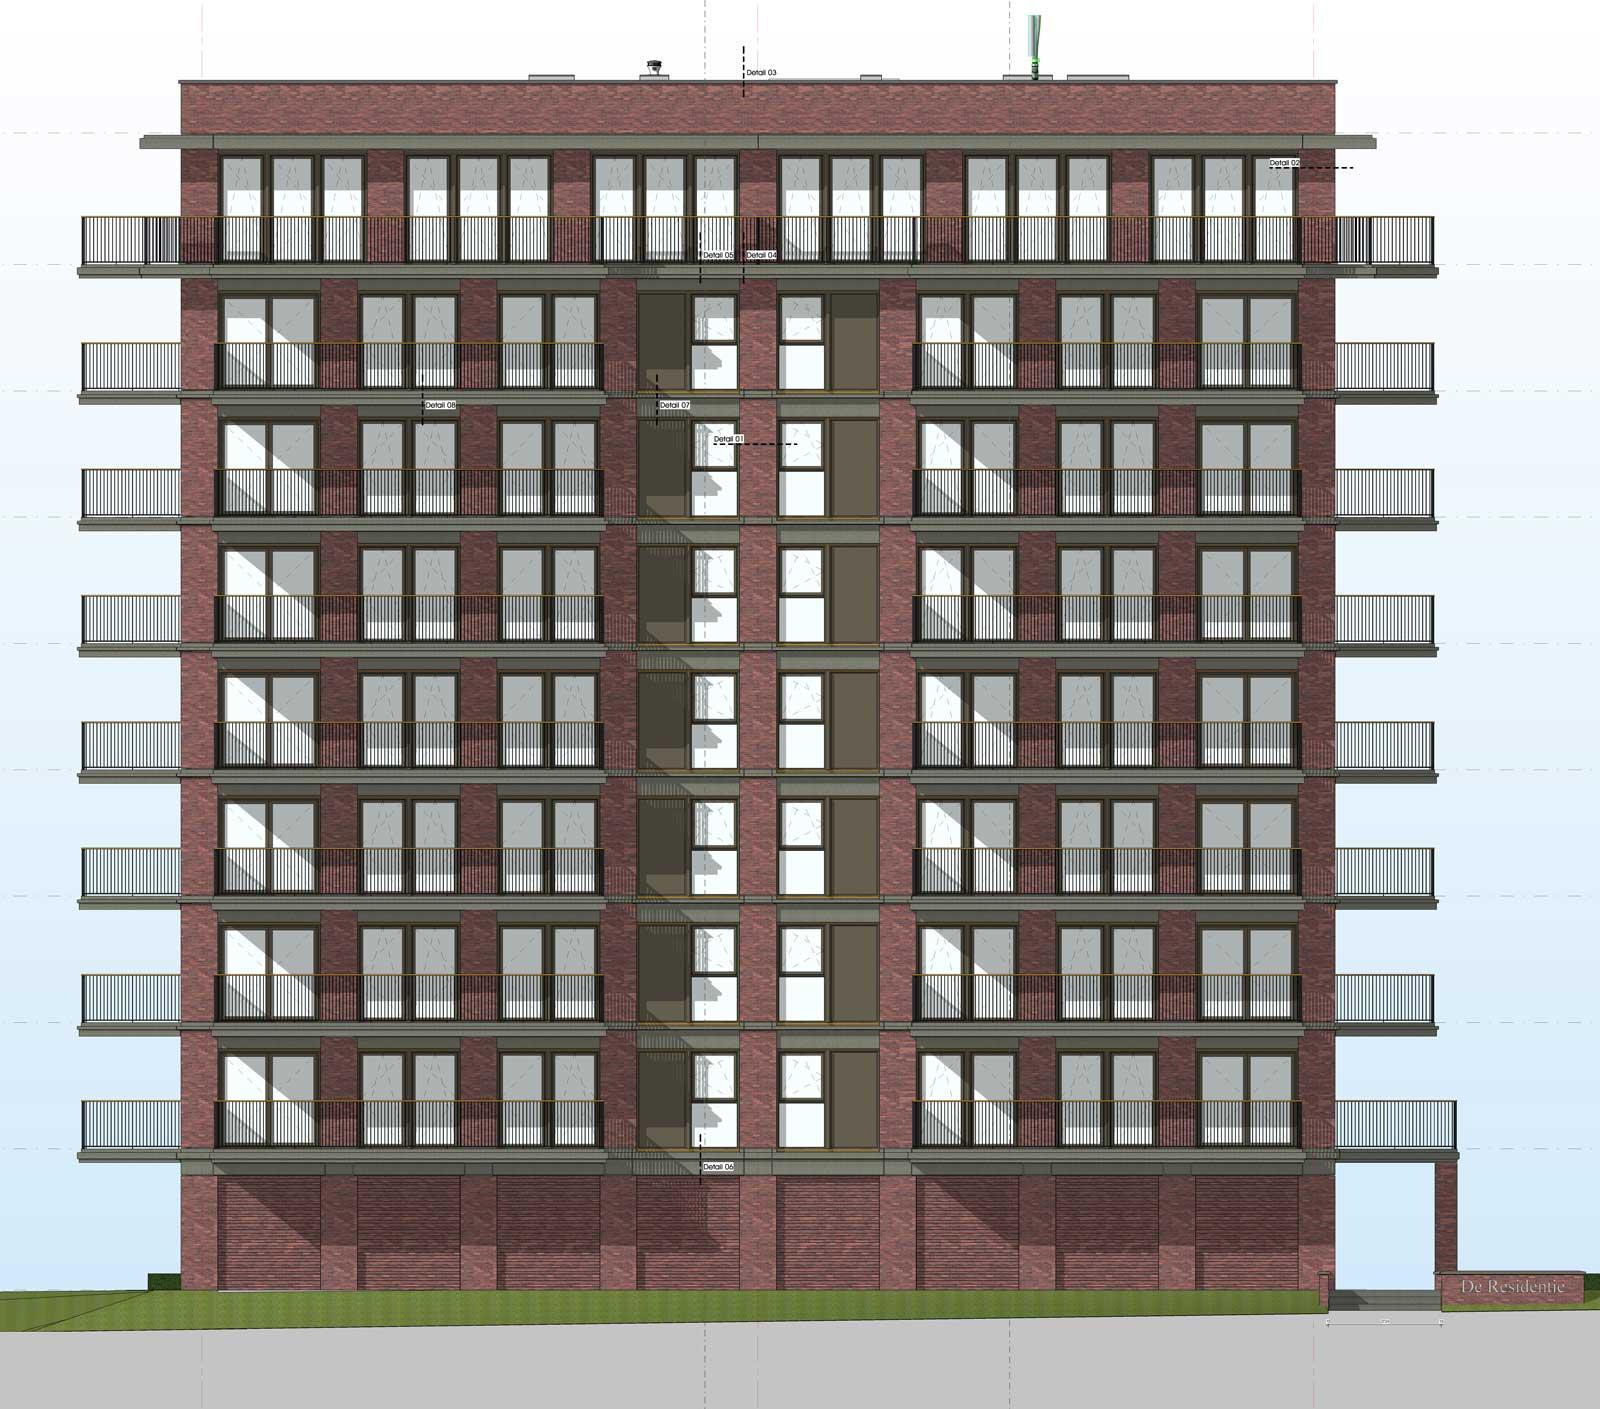 Ede residentie Enka appartementencomplex -Voorgevel